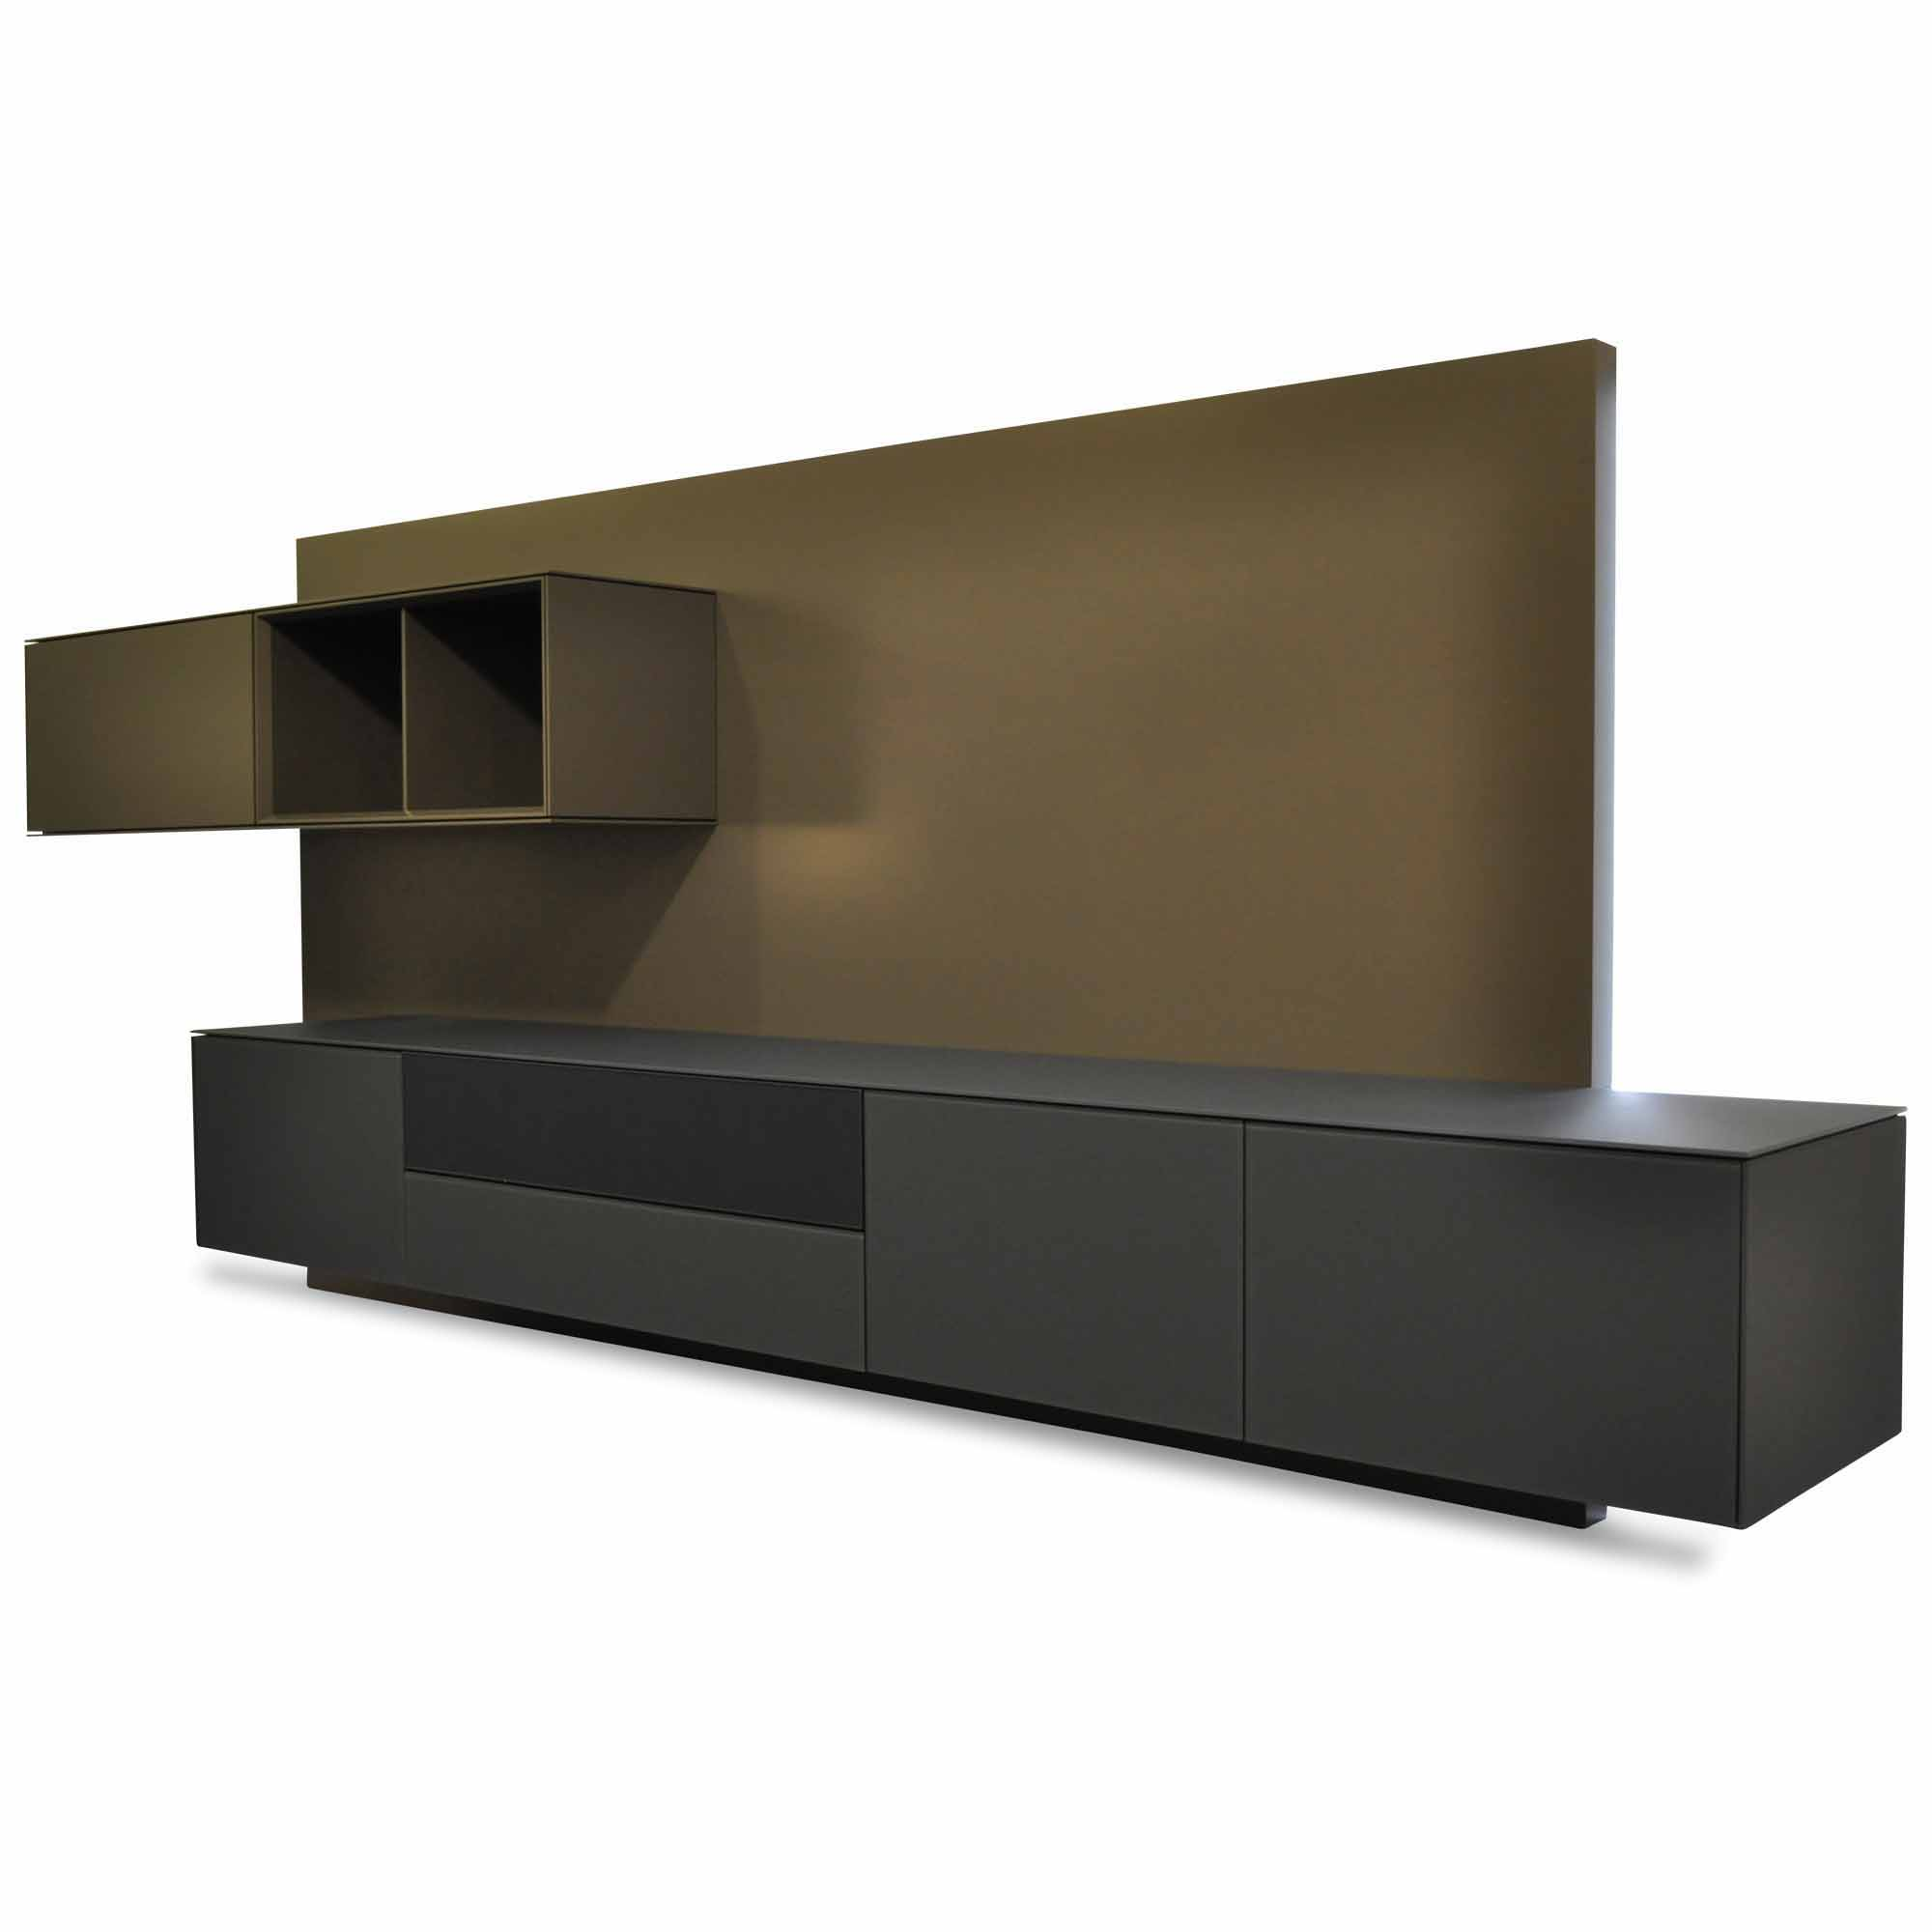 wohnwand soma kettnaker schr nke regale g nstig kaufen m belfirst. Black Bedroom Furniture Sets. Home Design Ideas